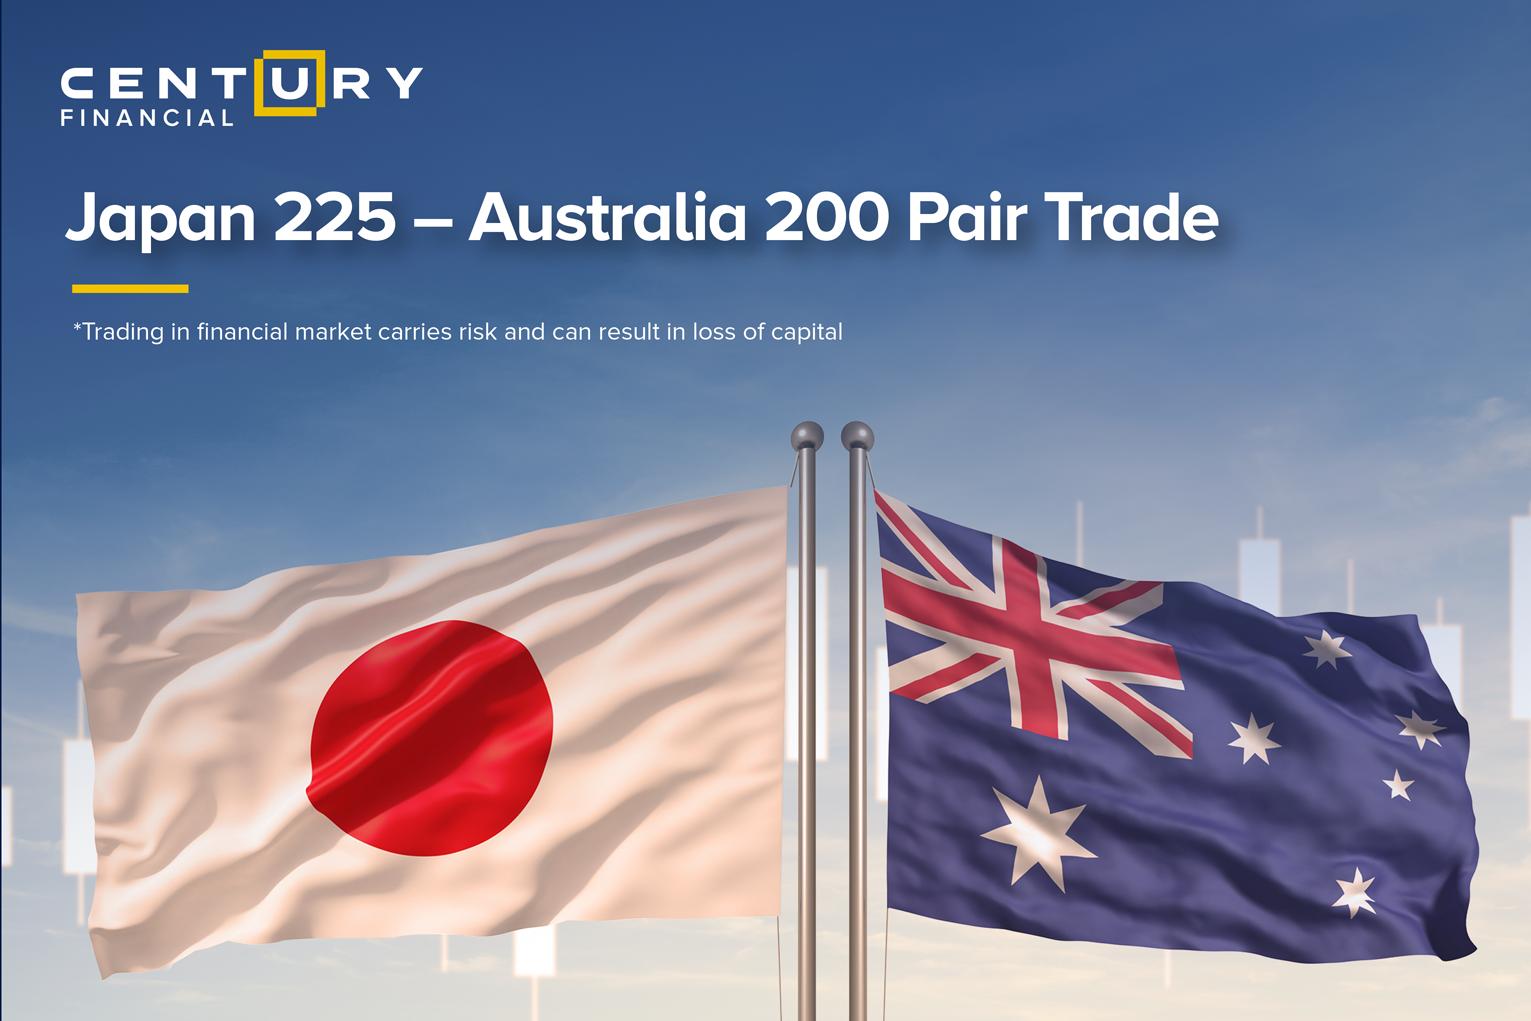 Japan 225 – Australia 200 Pair Trade